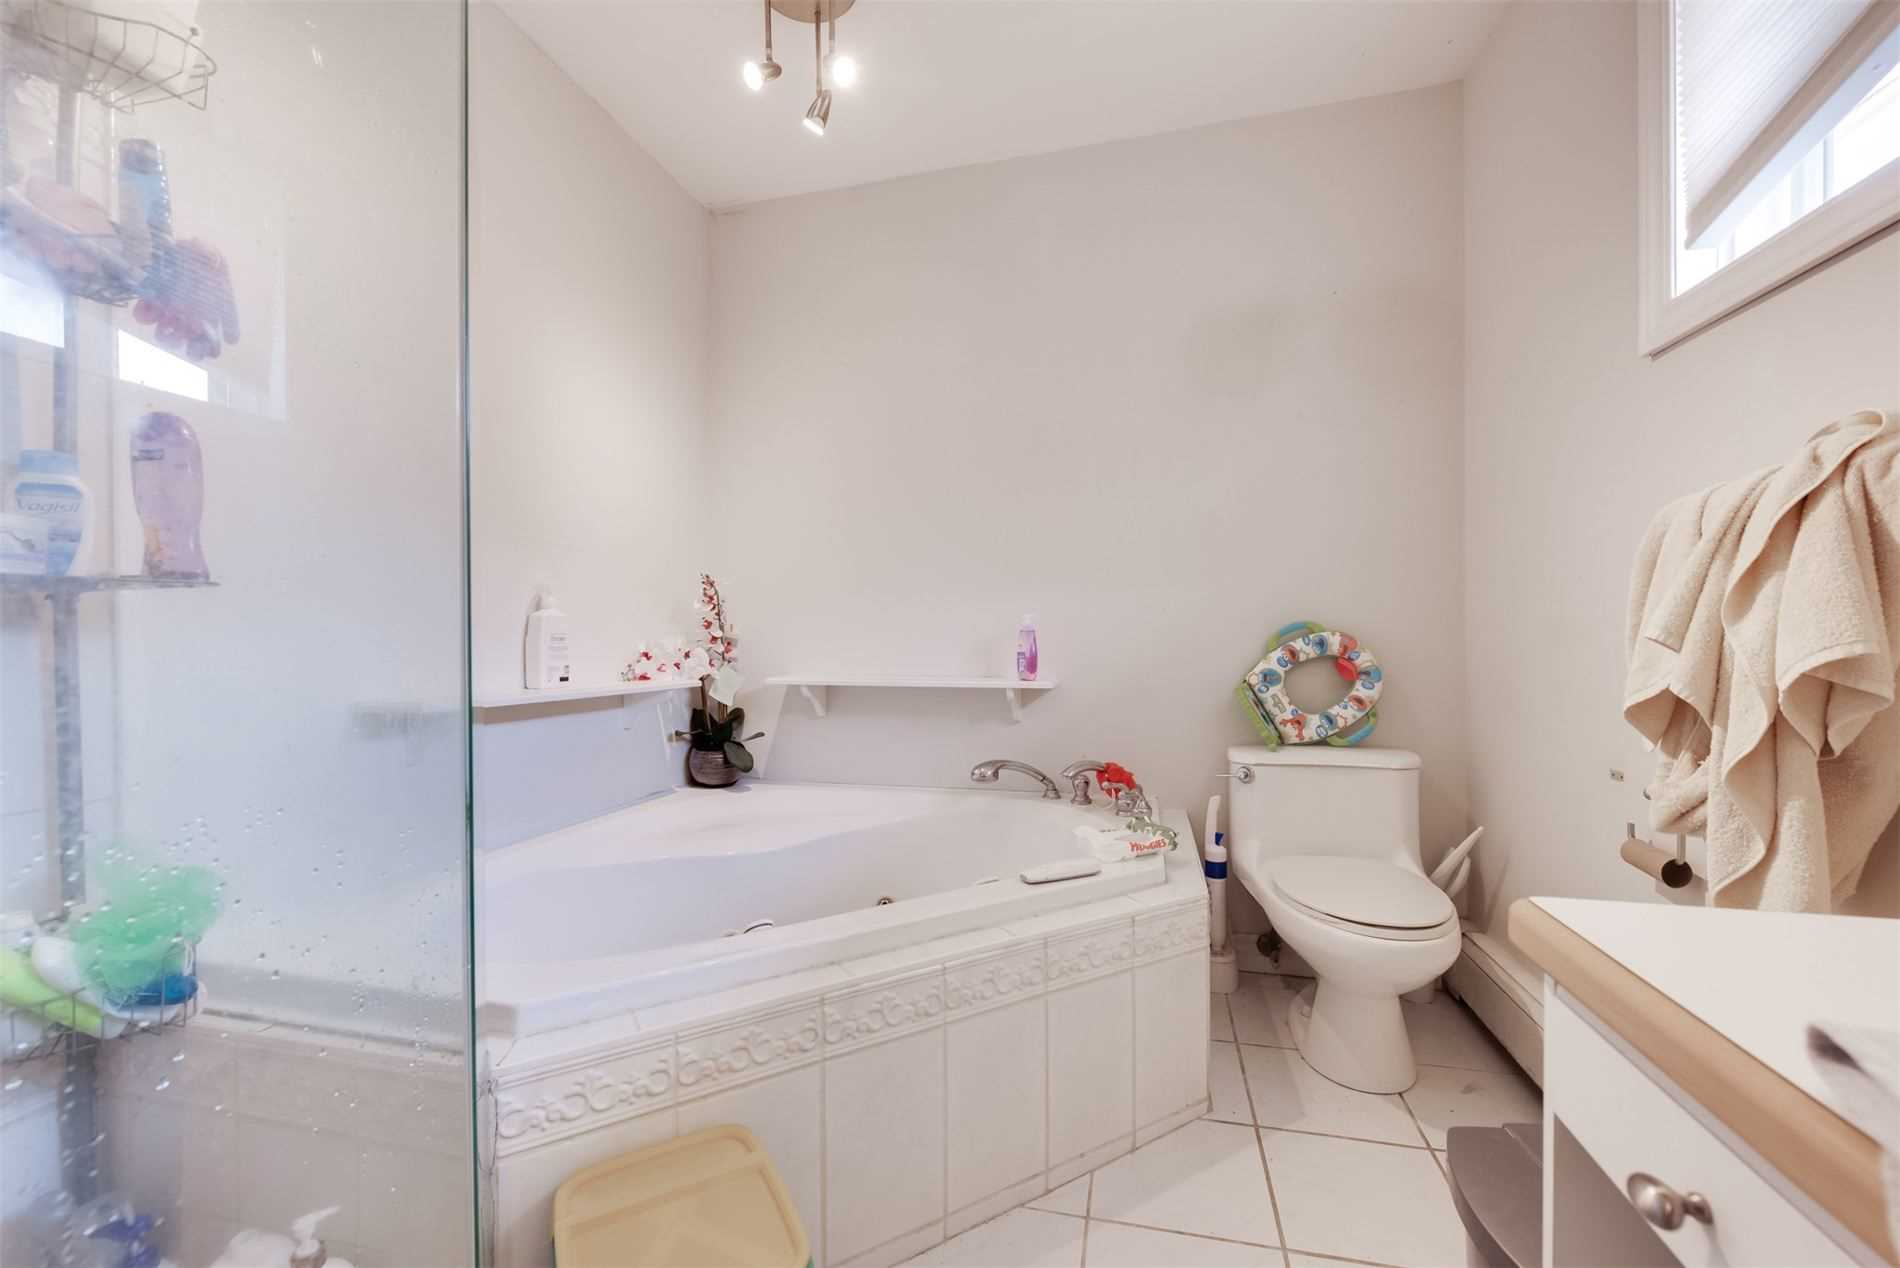 161 Peel St, Barrie, Ontario L4N 3L7, 3 Bedrooms Bedrooms, 6 Rooms Rooms,4 BathroomsBathrooms,Detached,For Sale,Peel,S5354206